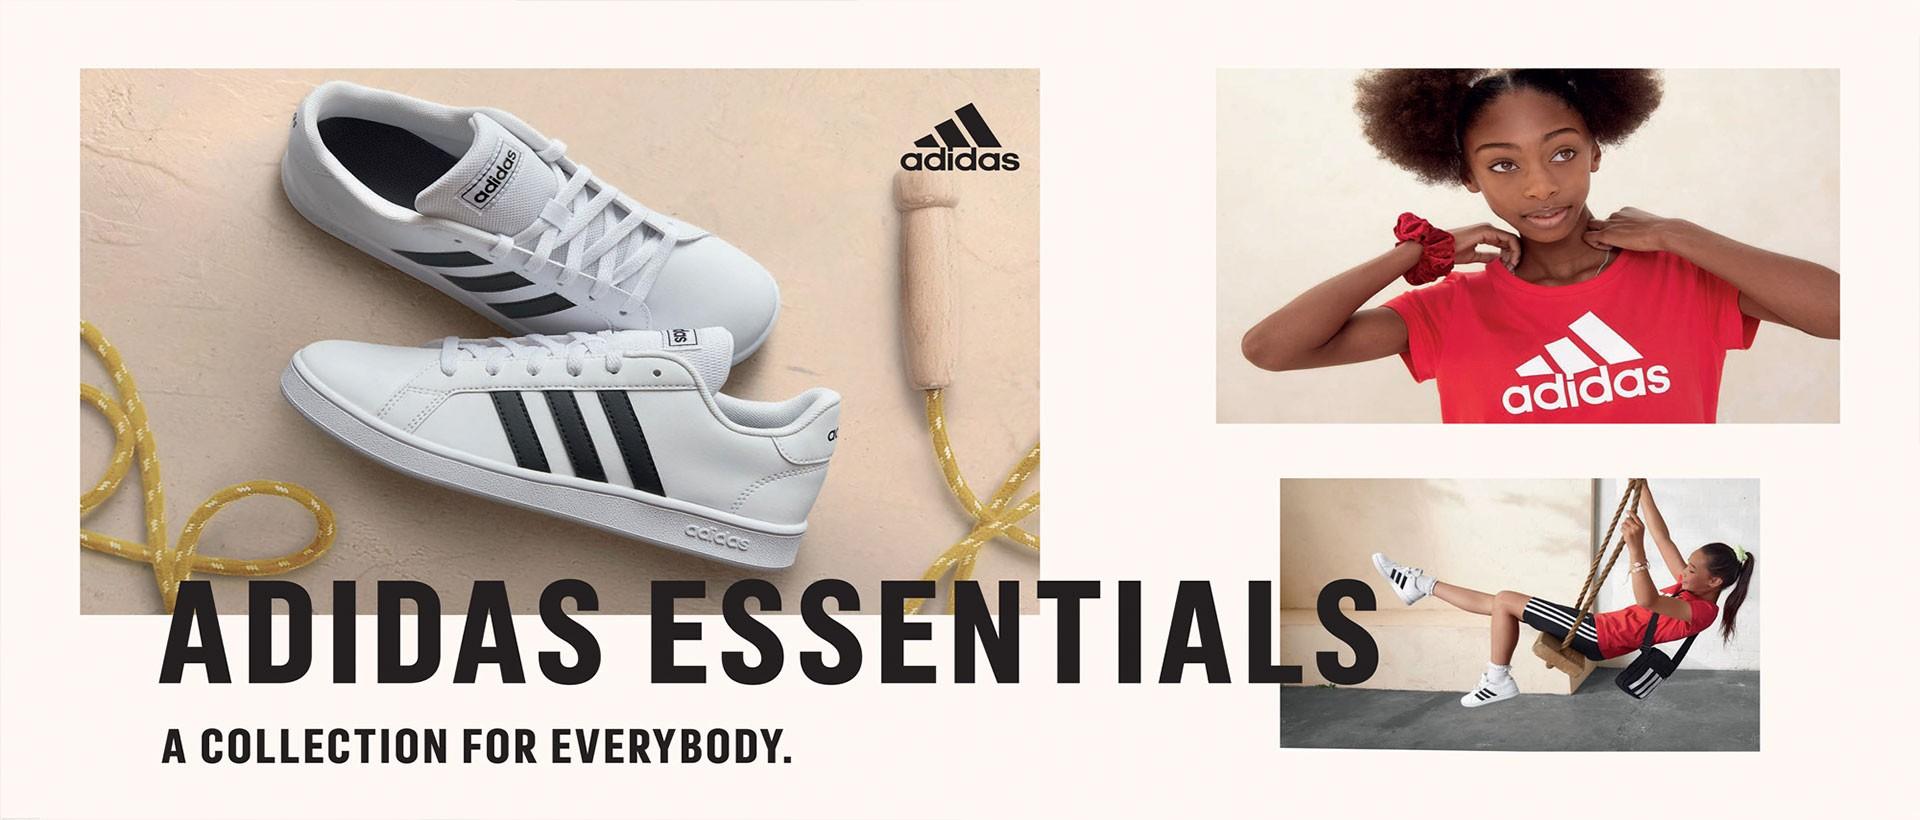 adidas essential